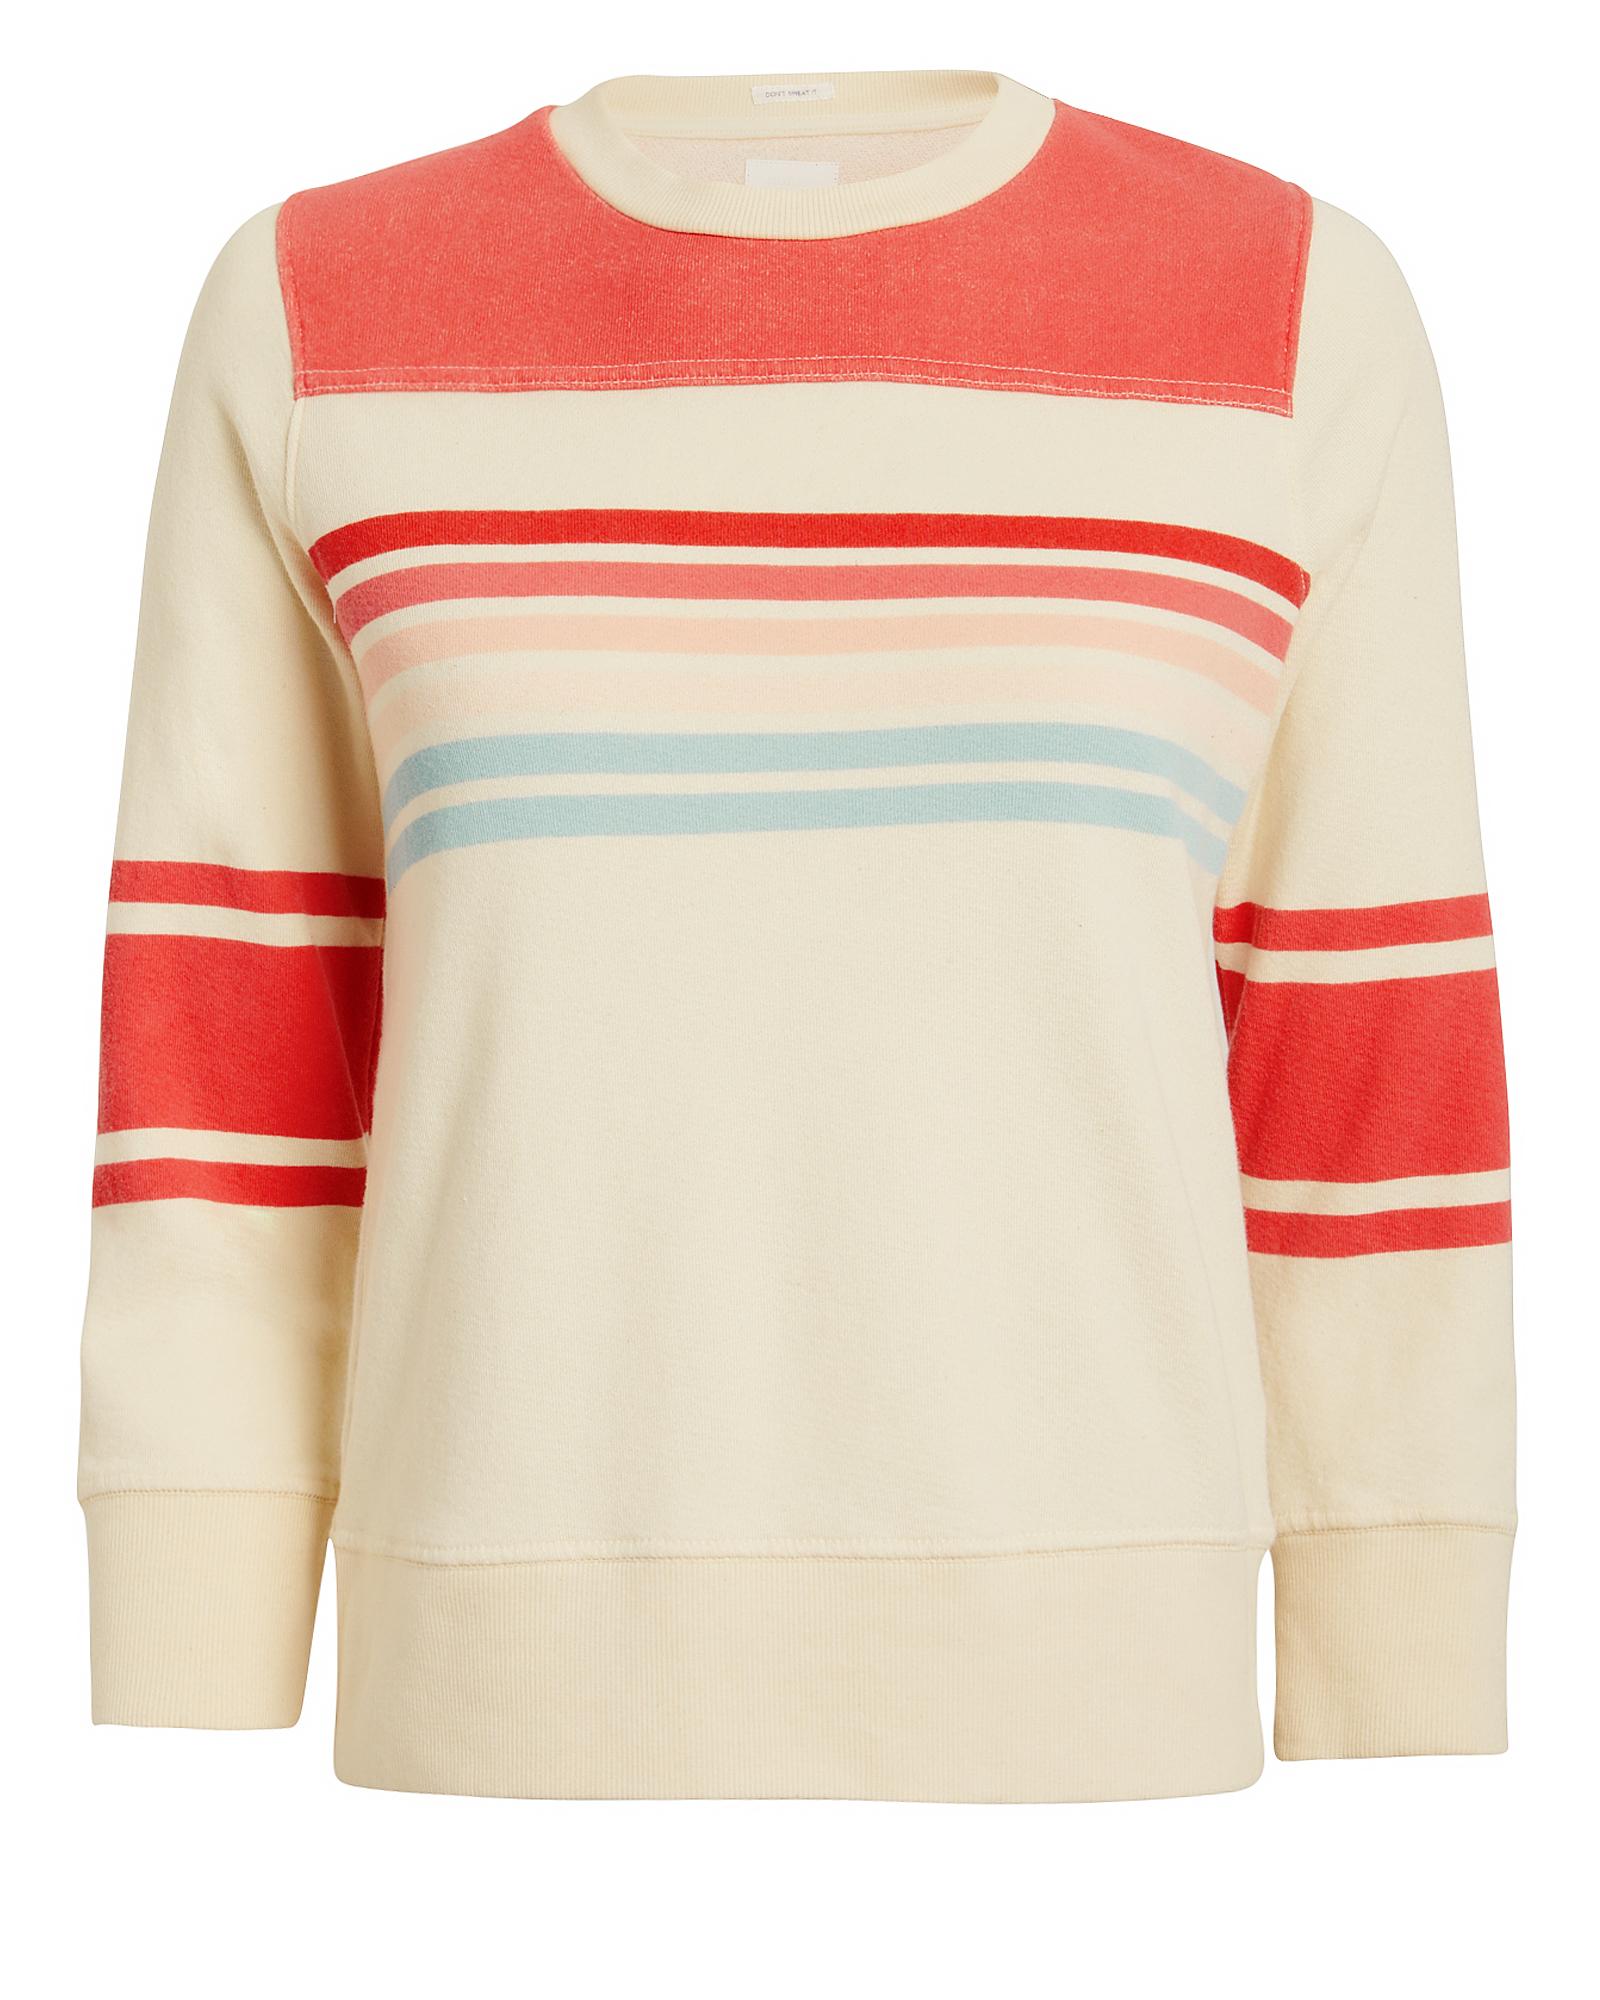 Mother T-shirts Koozie Rainbows Ever After Sweatshirt